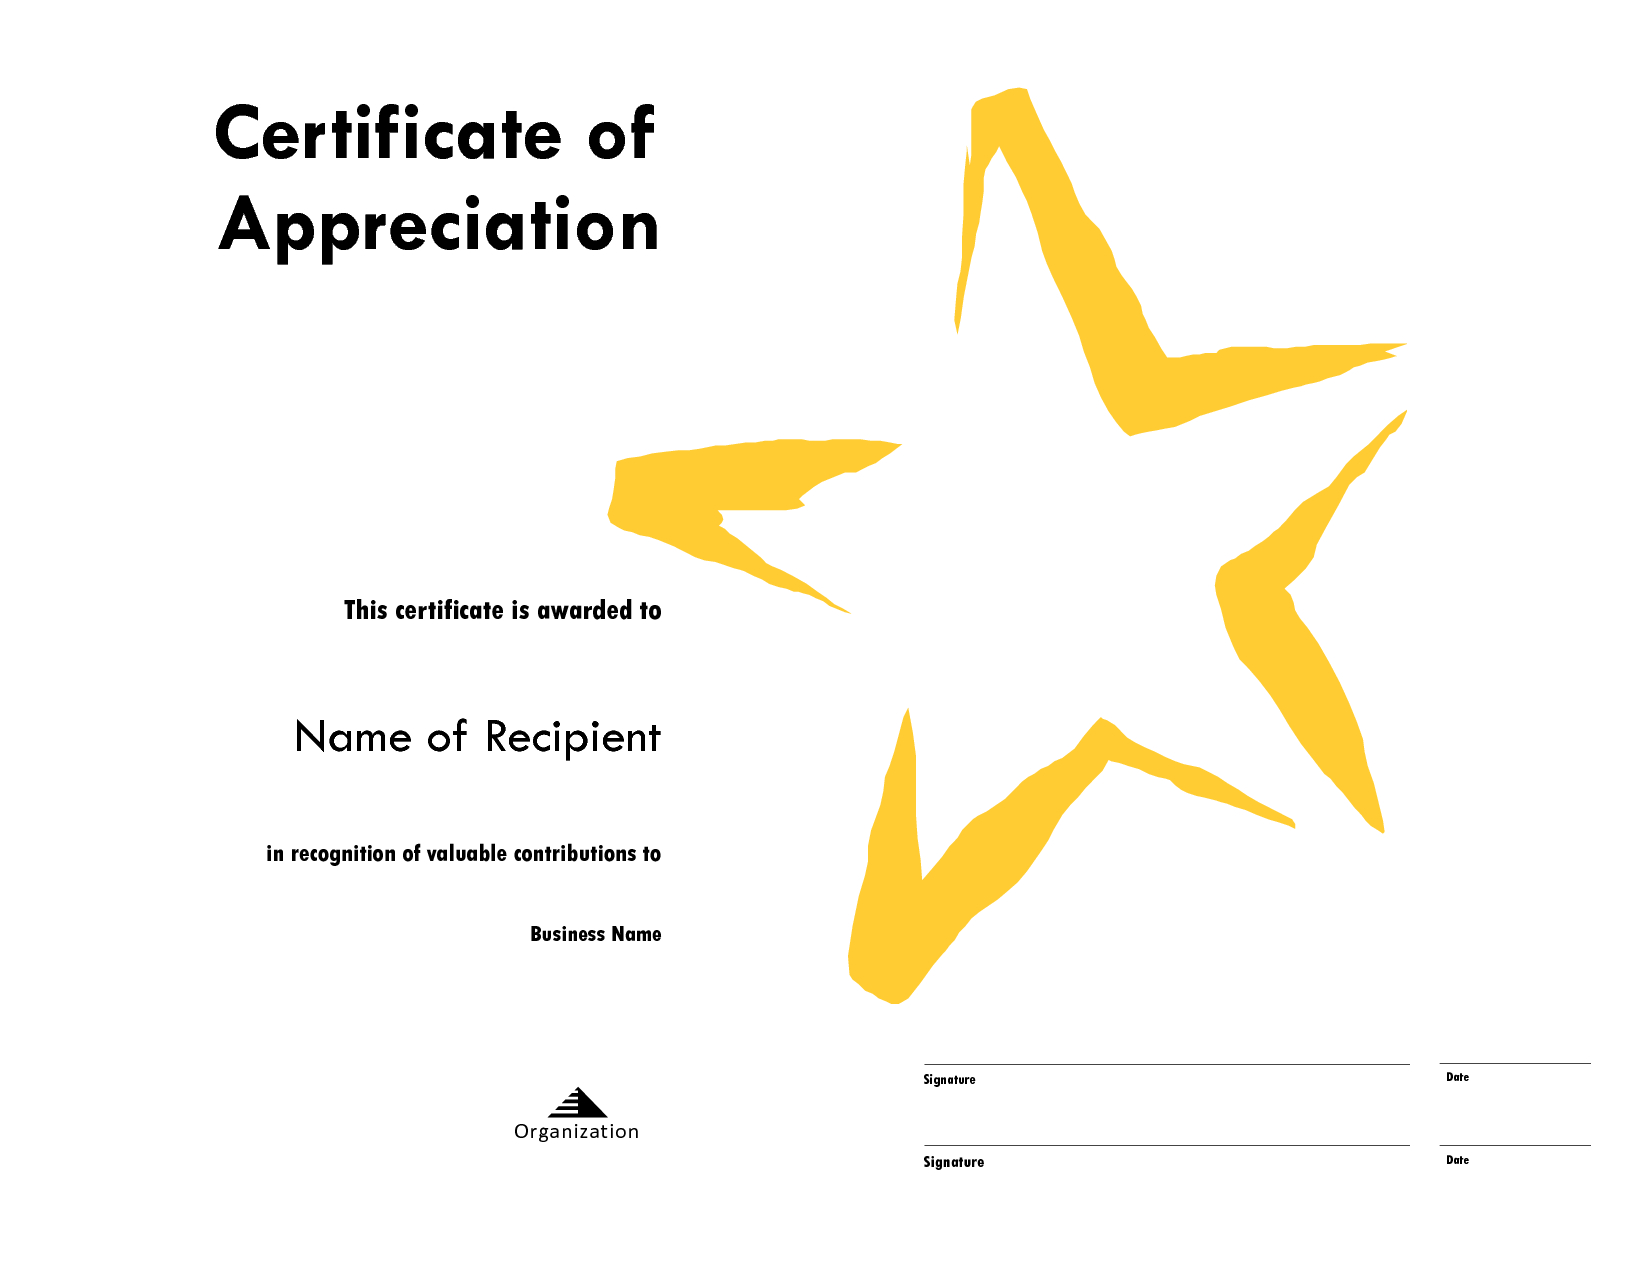 Star Certificate Templates Free - Karan.ald2014 Within Star Certificate Templates Free